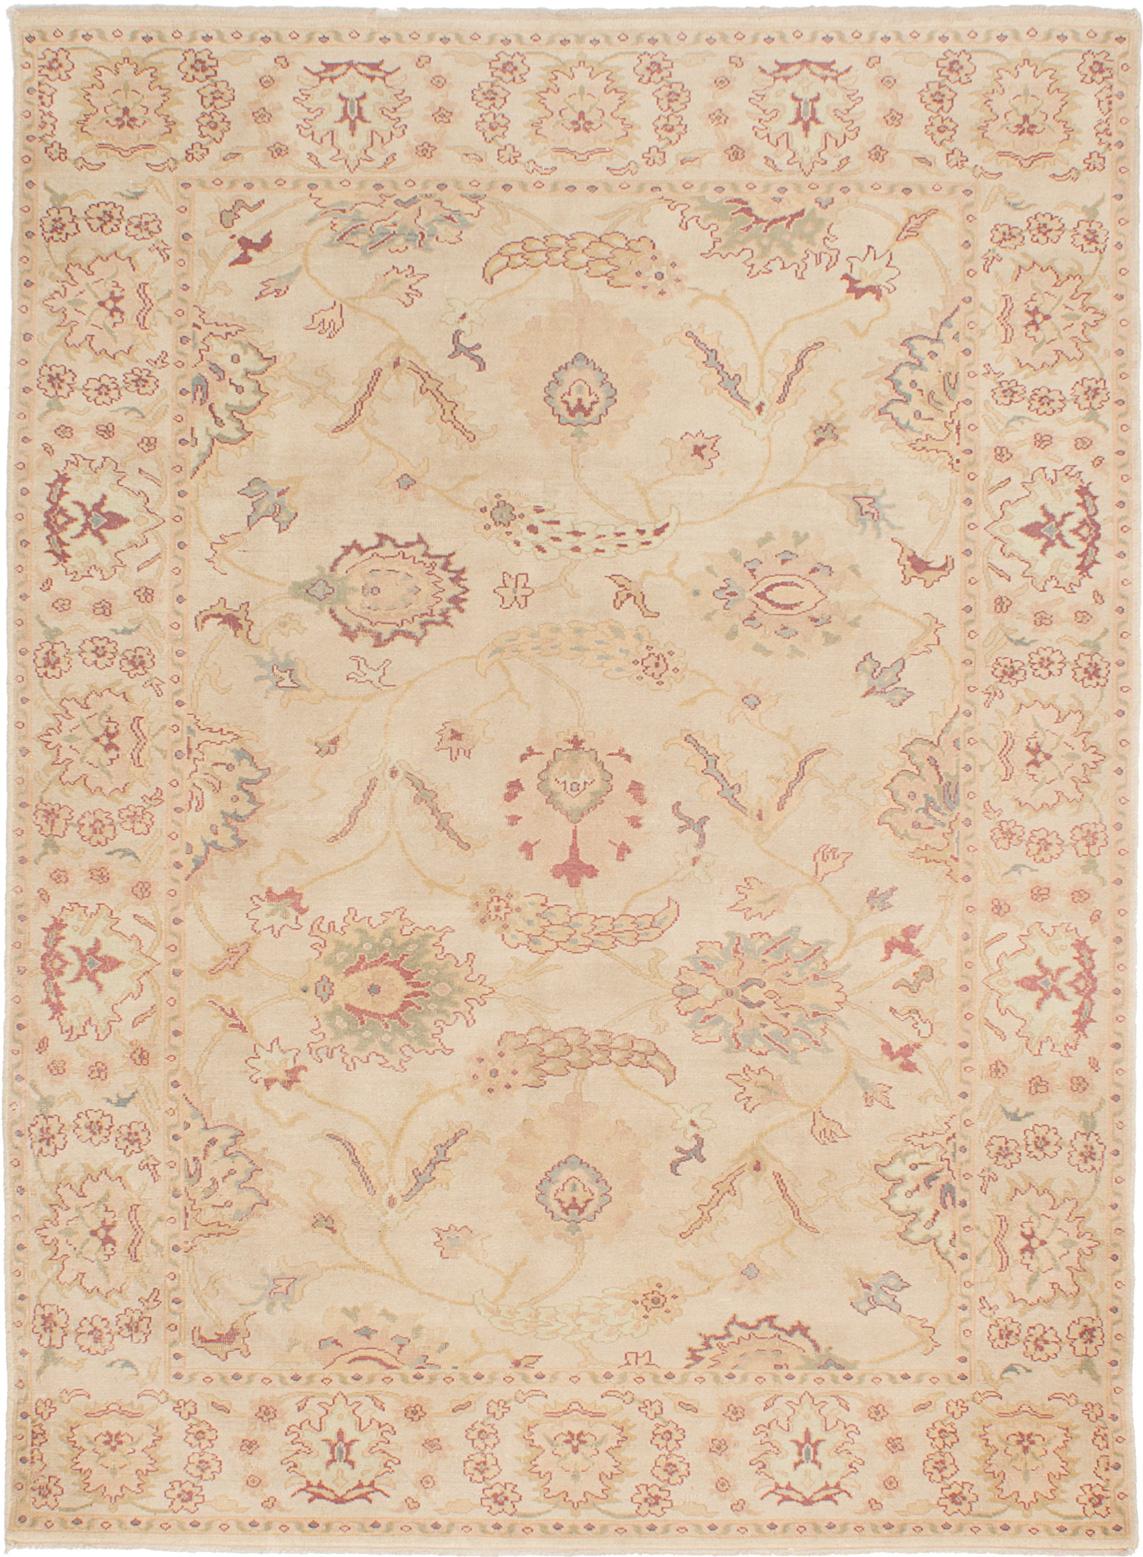 "Hand-knotted Authentic Ushak Ivory Wool Rug 6'2"" x 8'5"" Size: 6'2"" x 8'5"""